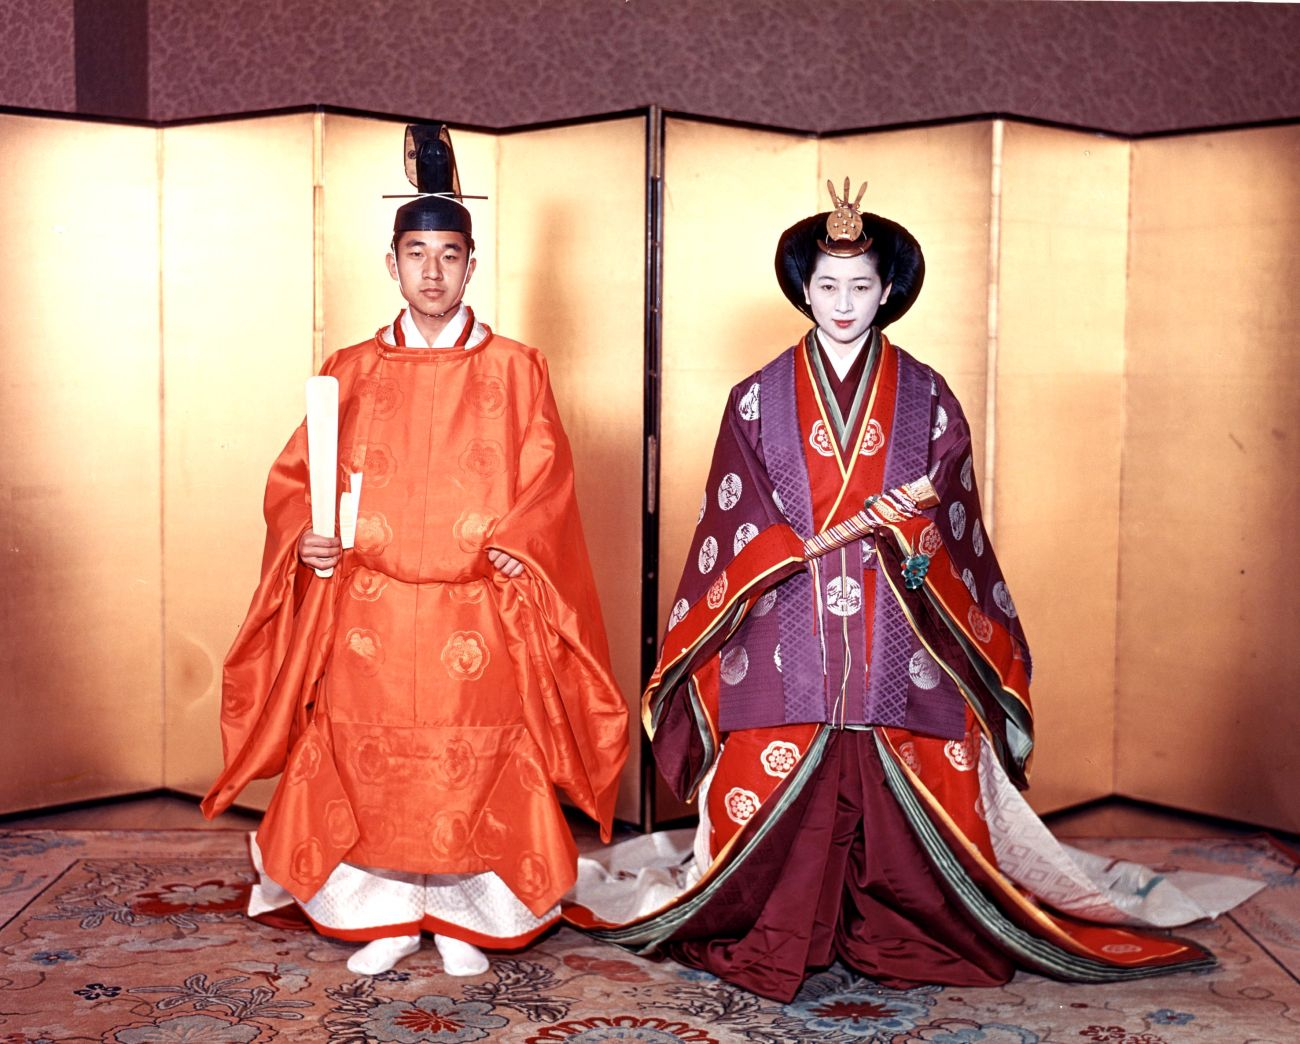 Japan Emperor from Showa to Heisei Era 006